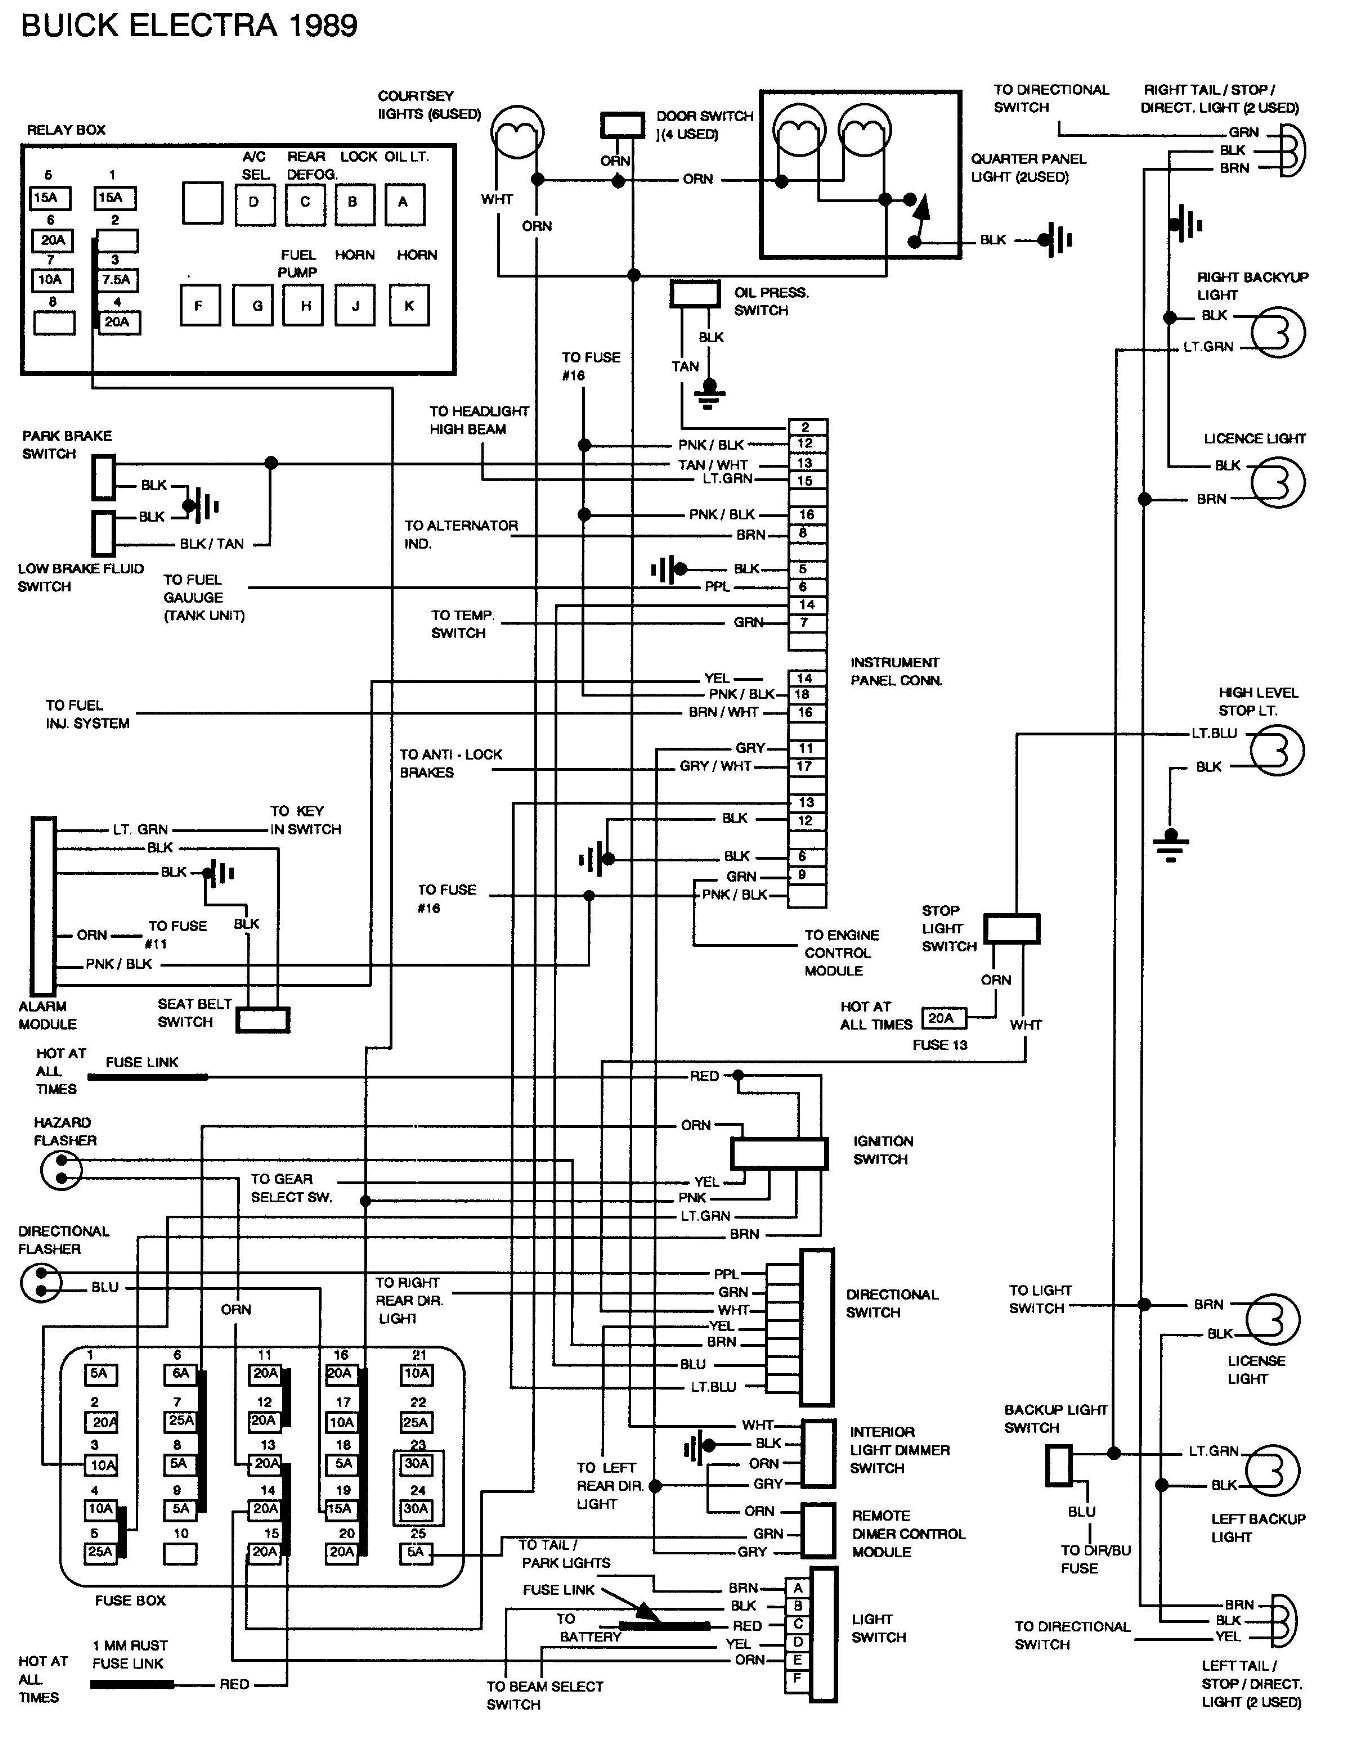 2004 Gmc Sierra Injector Wire Sqemtic Diagram] 2006 Gmc Pcm Wiring Diagram Full Version Hd Quality Of 2004 Gmc Sierra Injector Wire Sqemtic